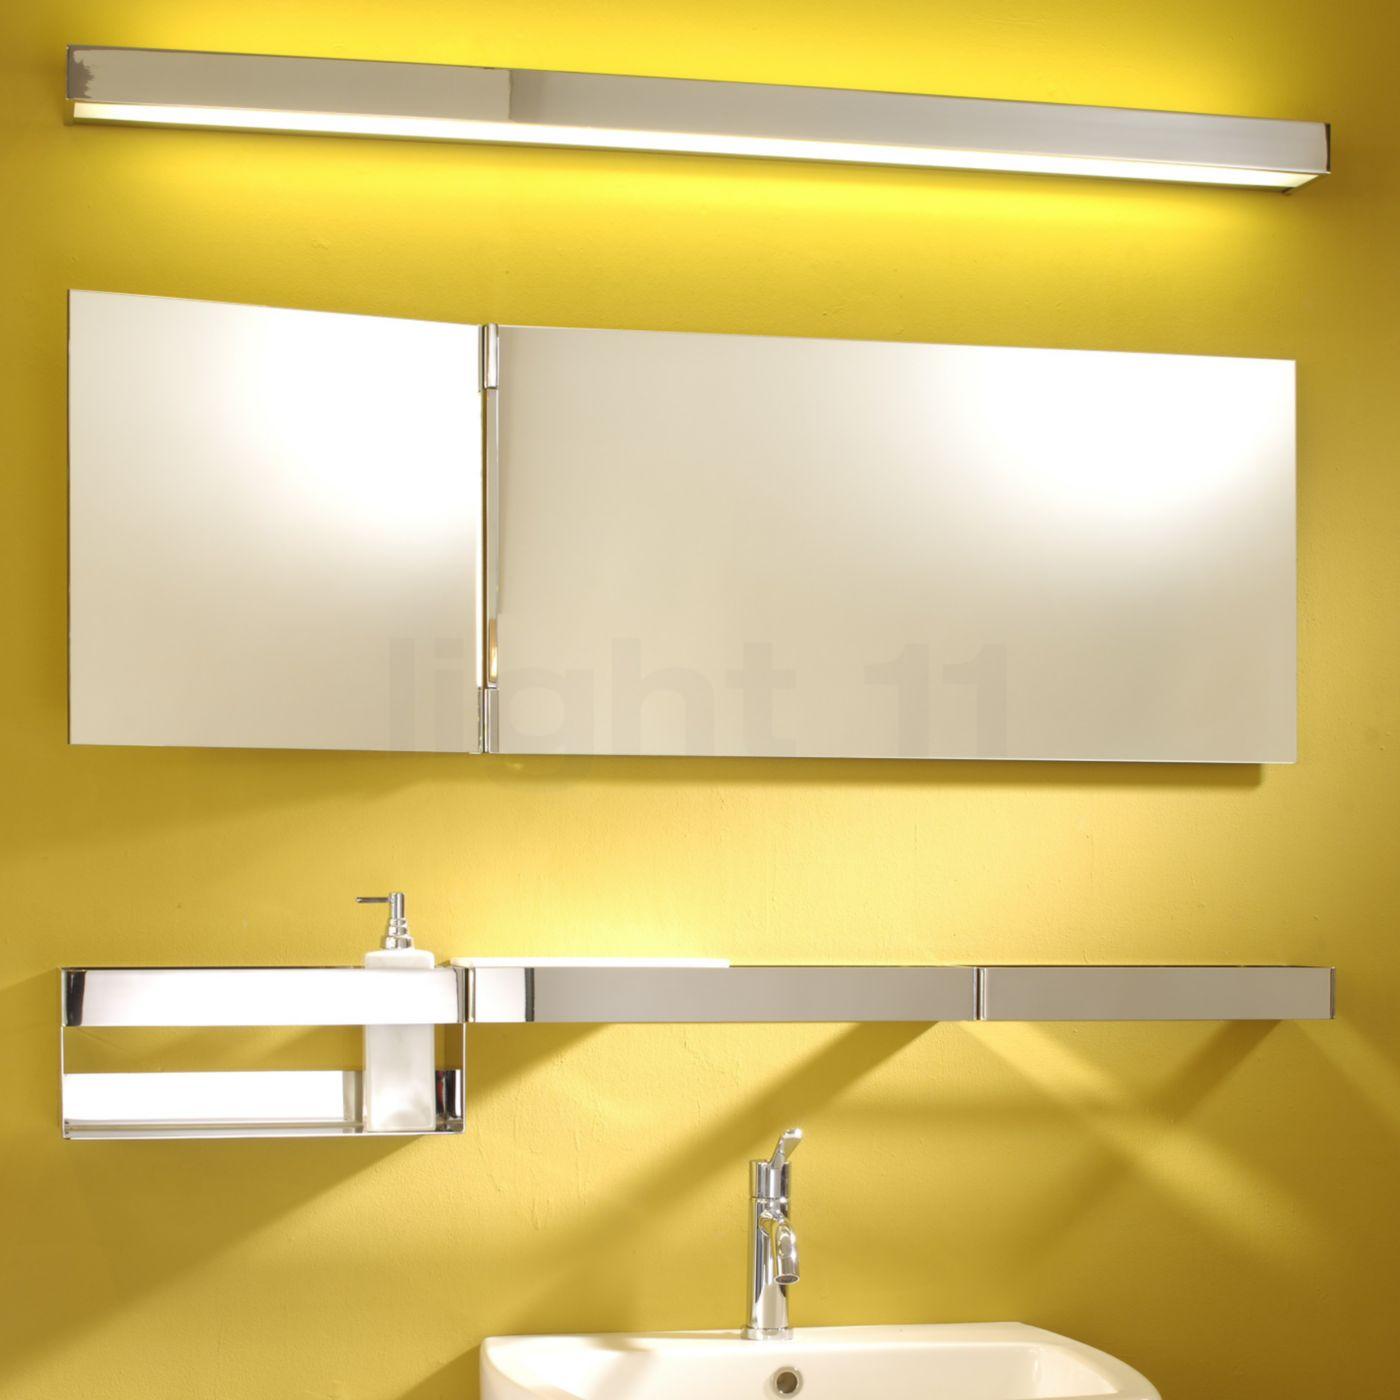 Buy Decor Walther Box 120 N - Wall Light 2,700 K LED at